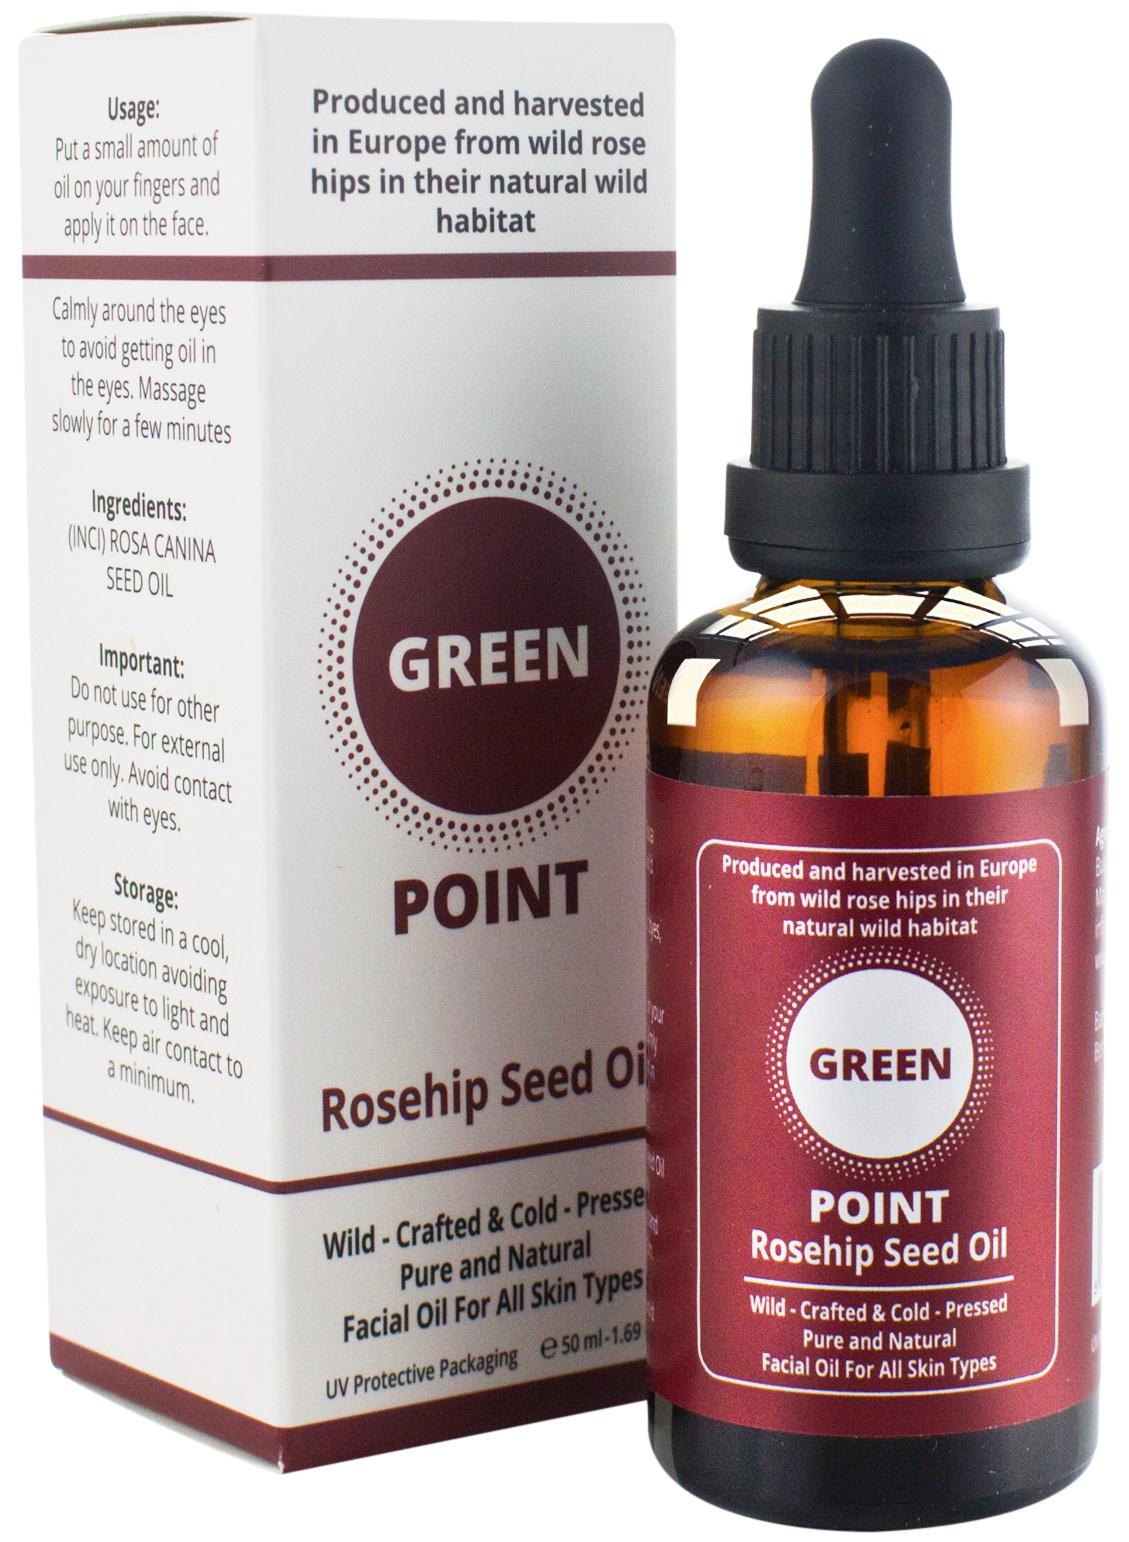 GREEN Rosehip Seed Oil